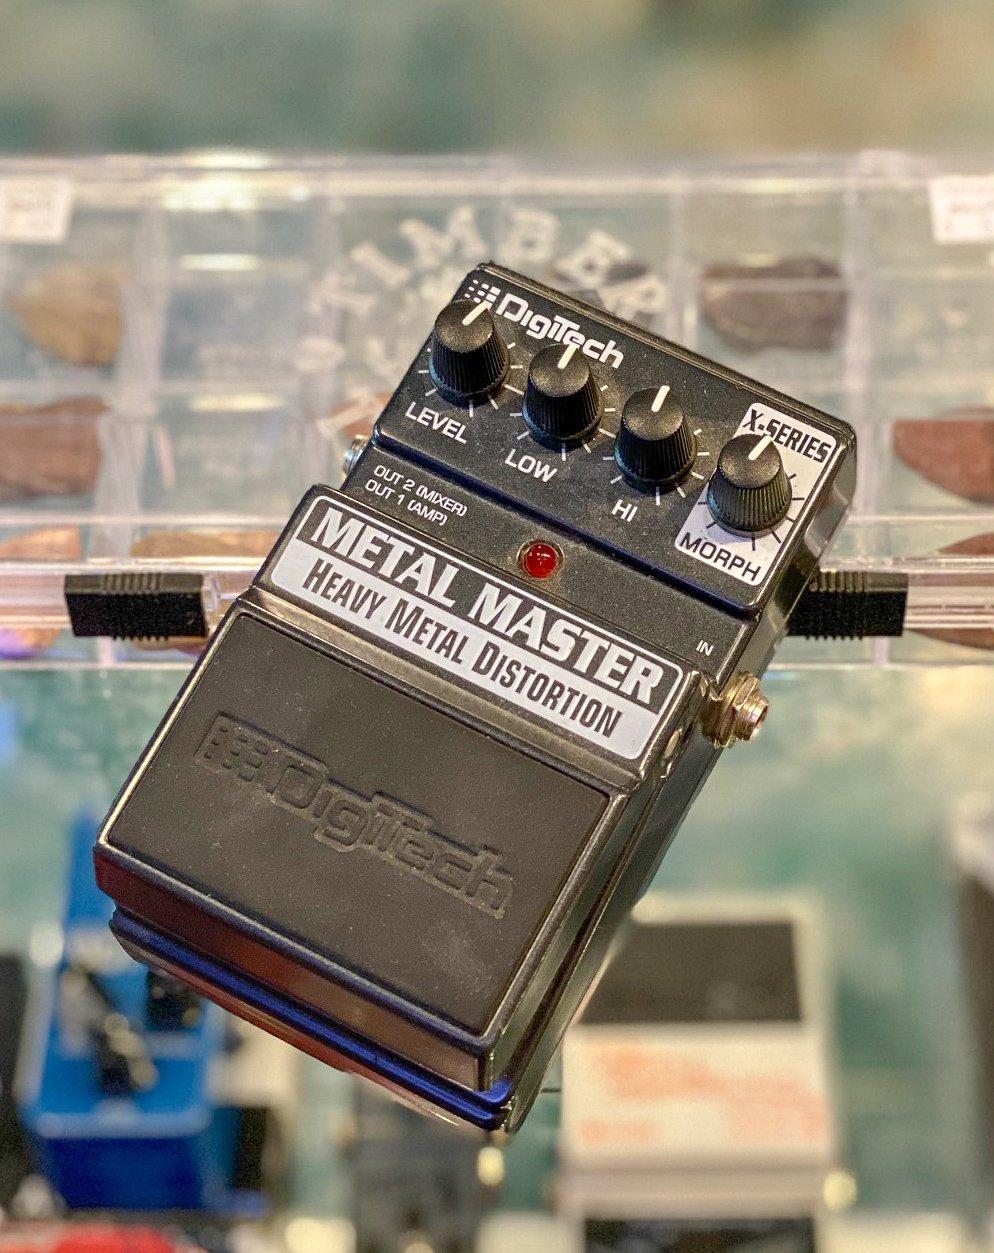 Digitech Metal Master distortion pedal